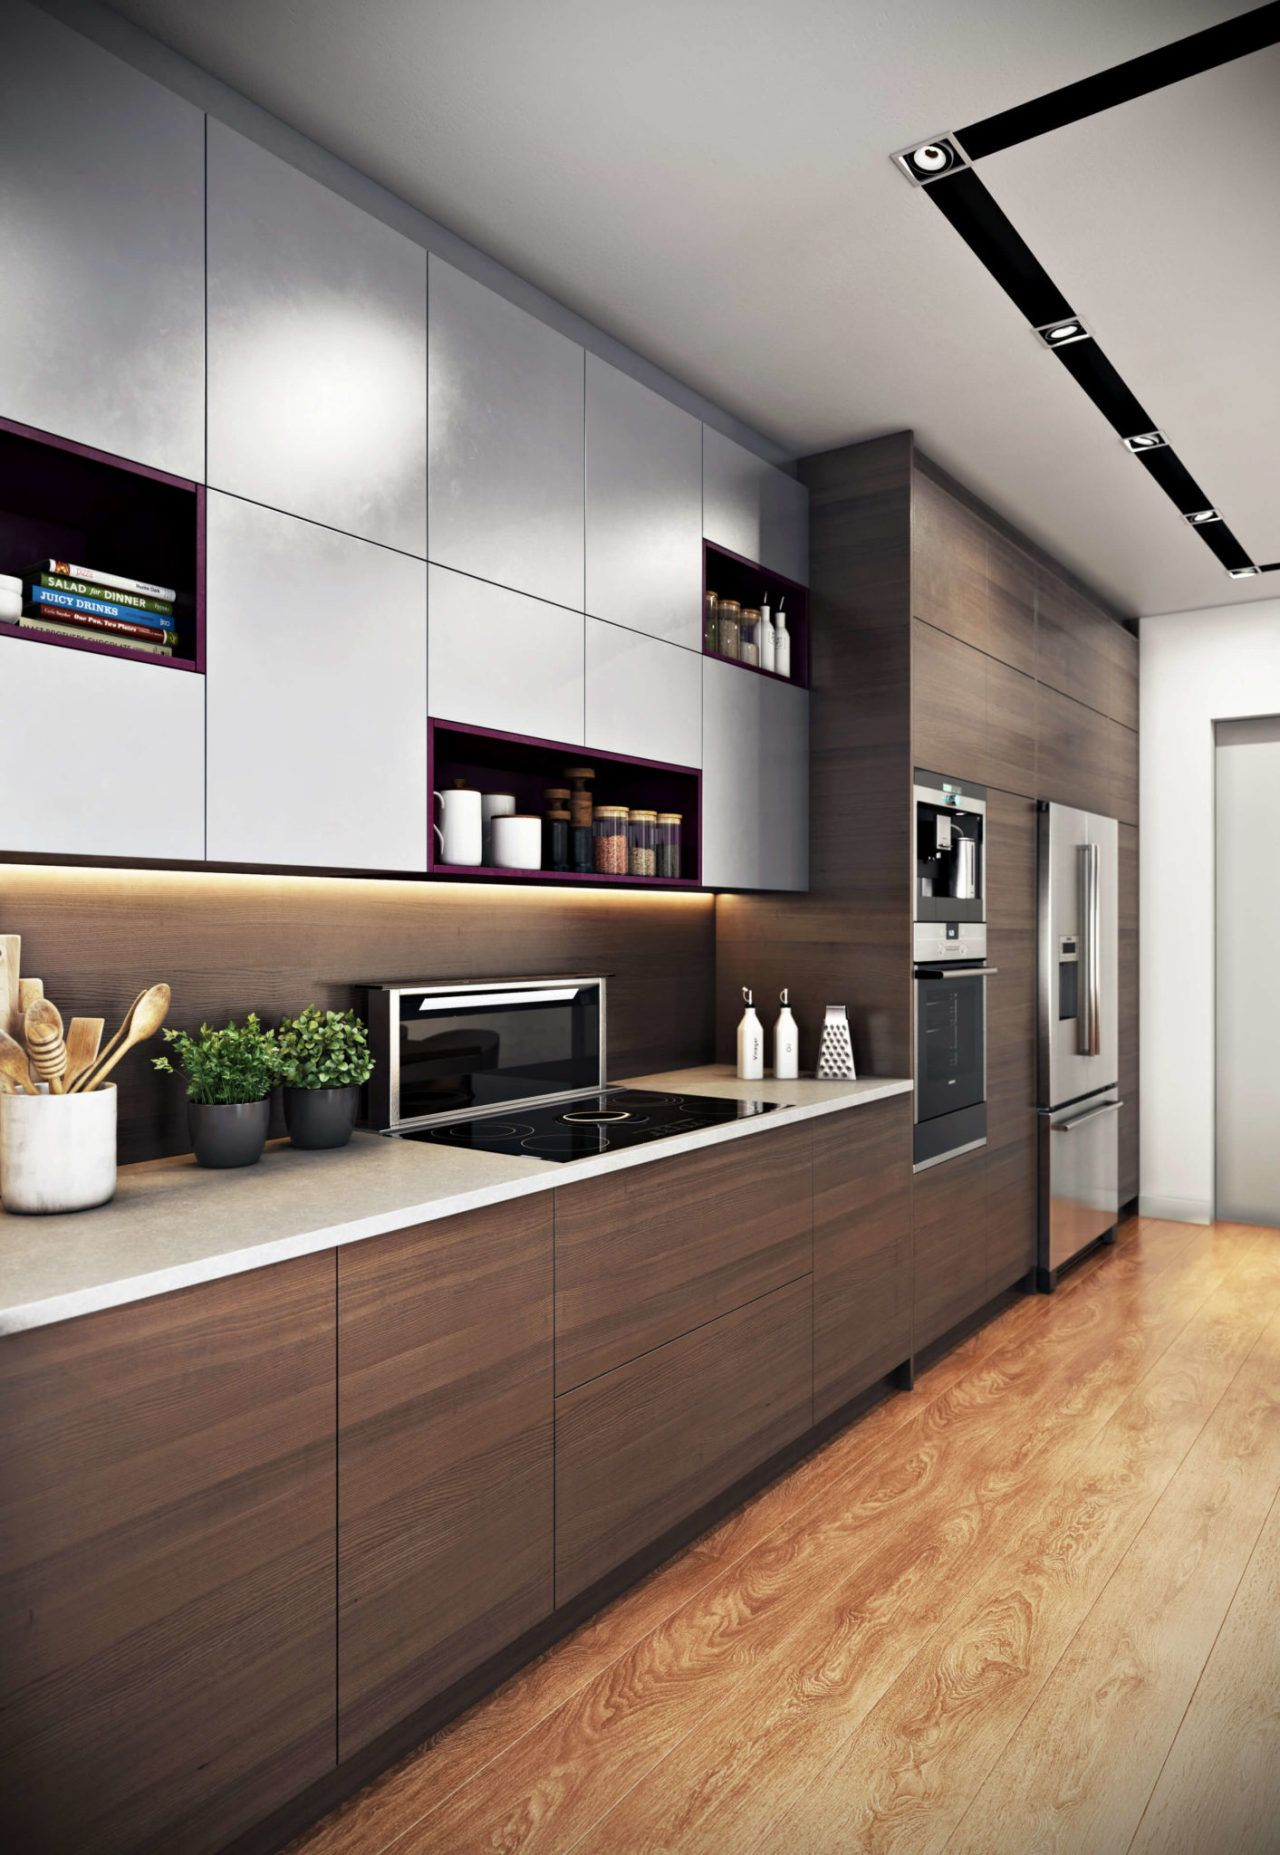 Home Interior Design U2014 Kitchen For Ultimate Sophistication The Kitchen.